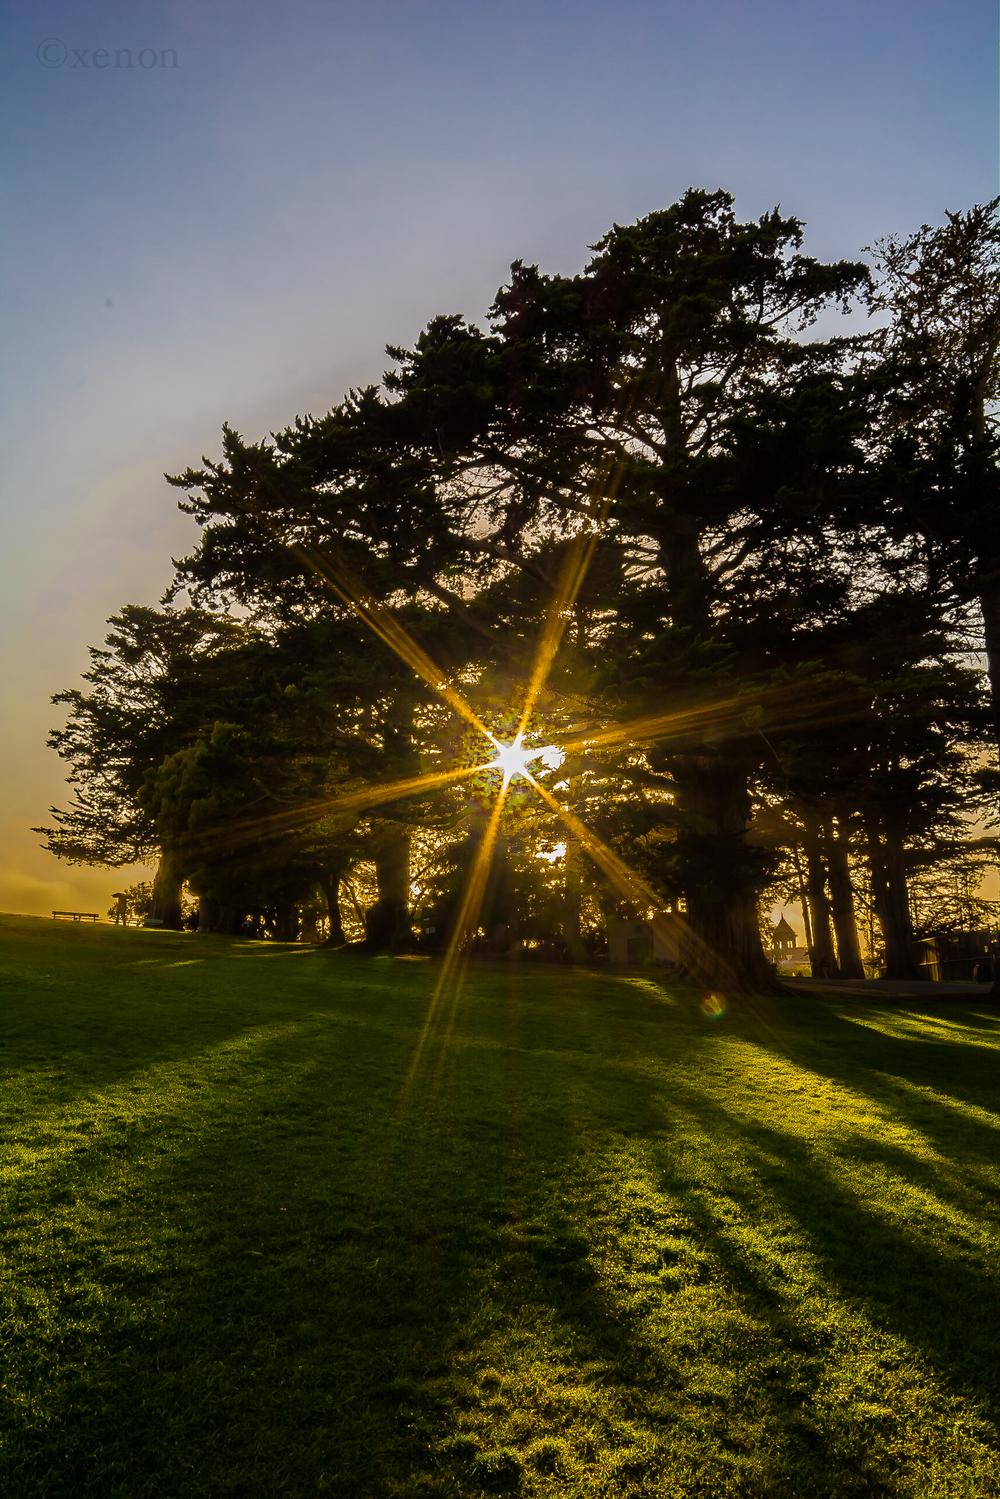 San Francisco, California - 12 June 2015.jpg